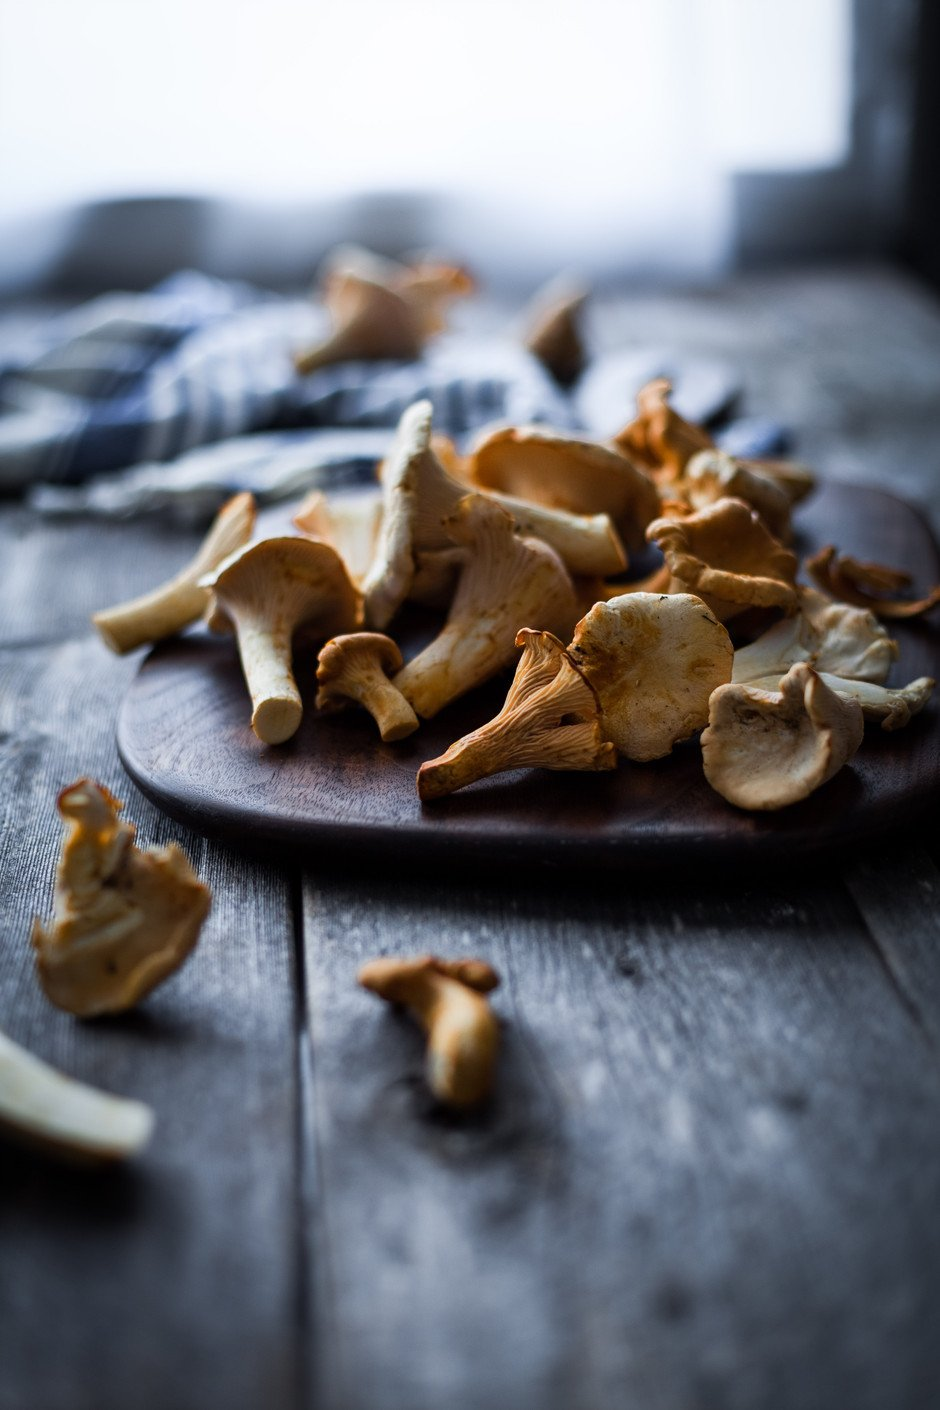 Chanterelle mushrooms on wood cutting board.